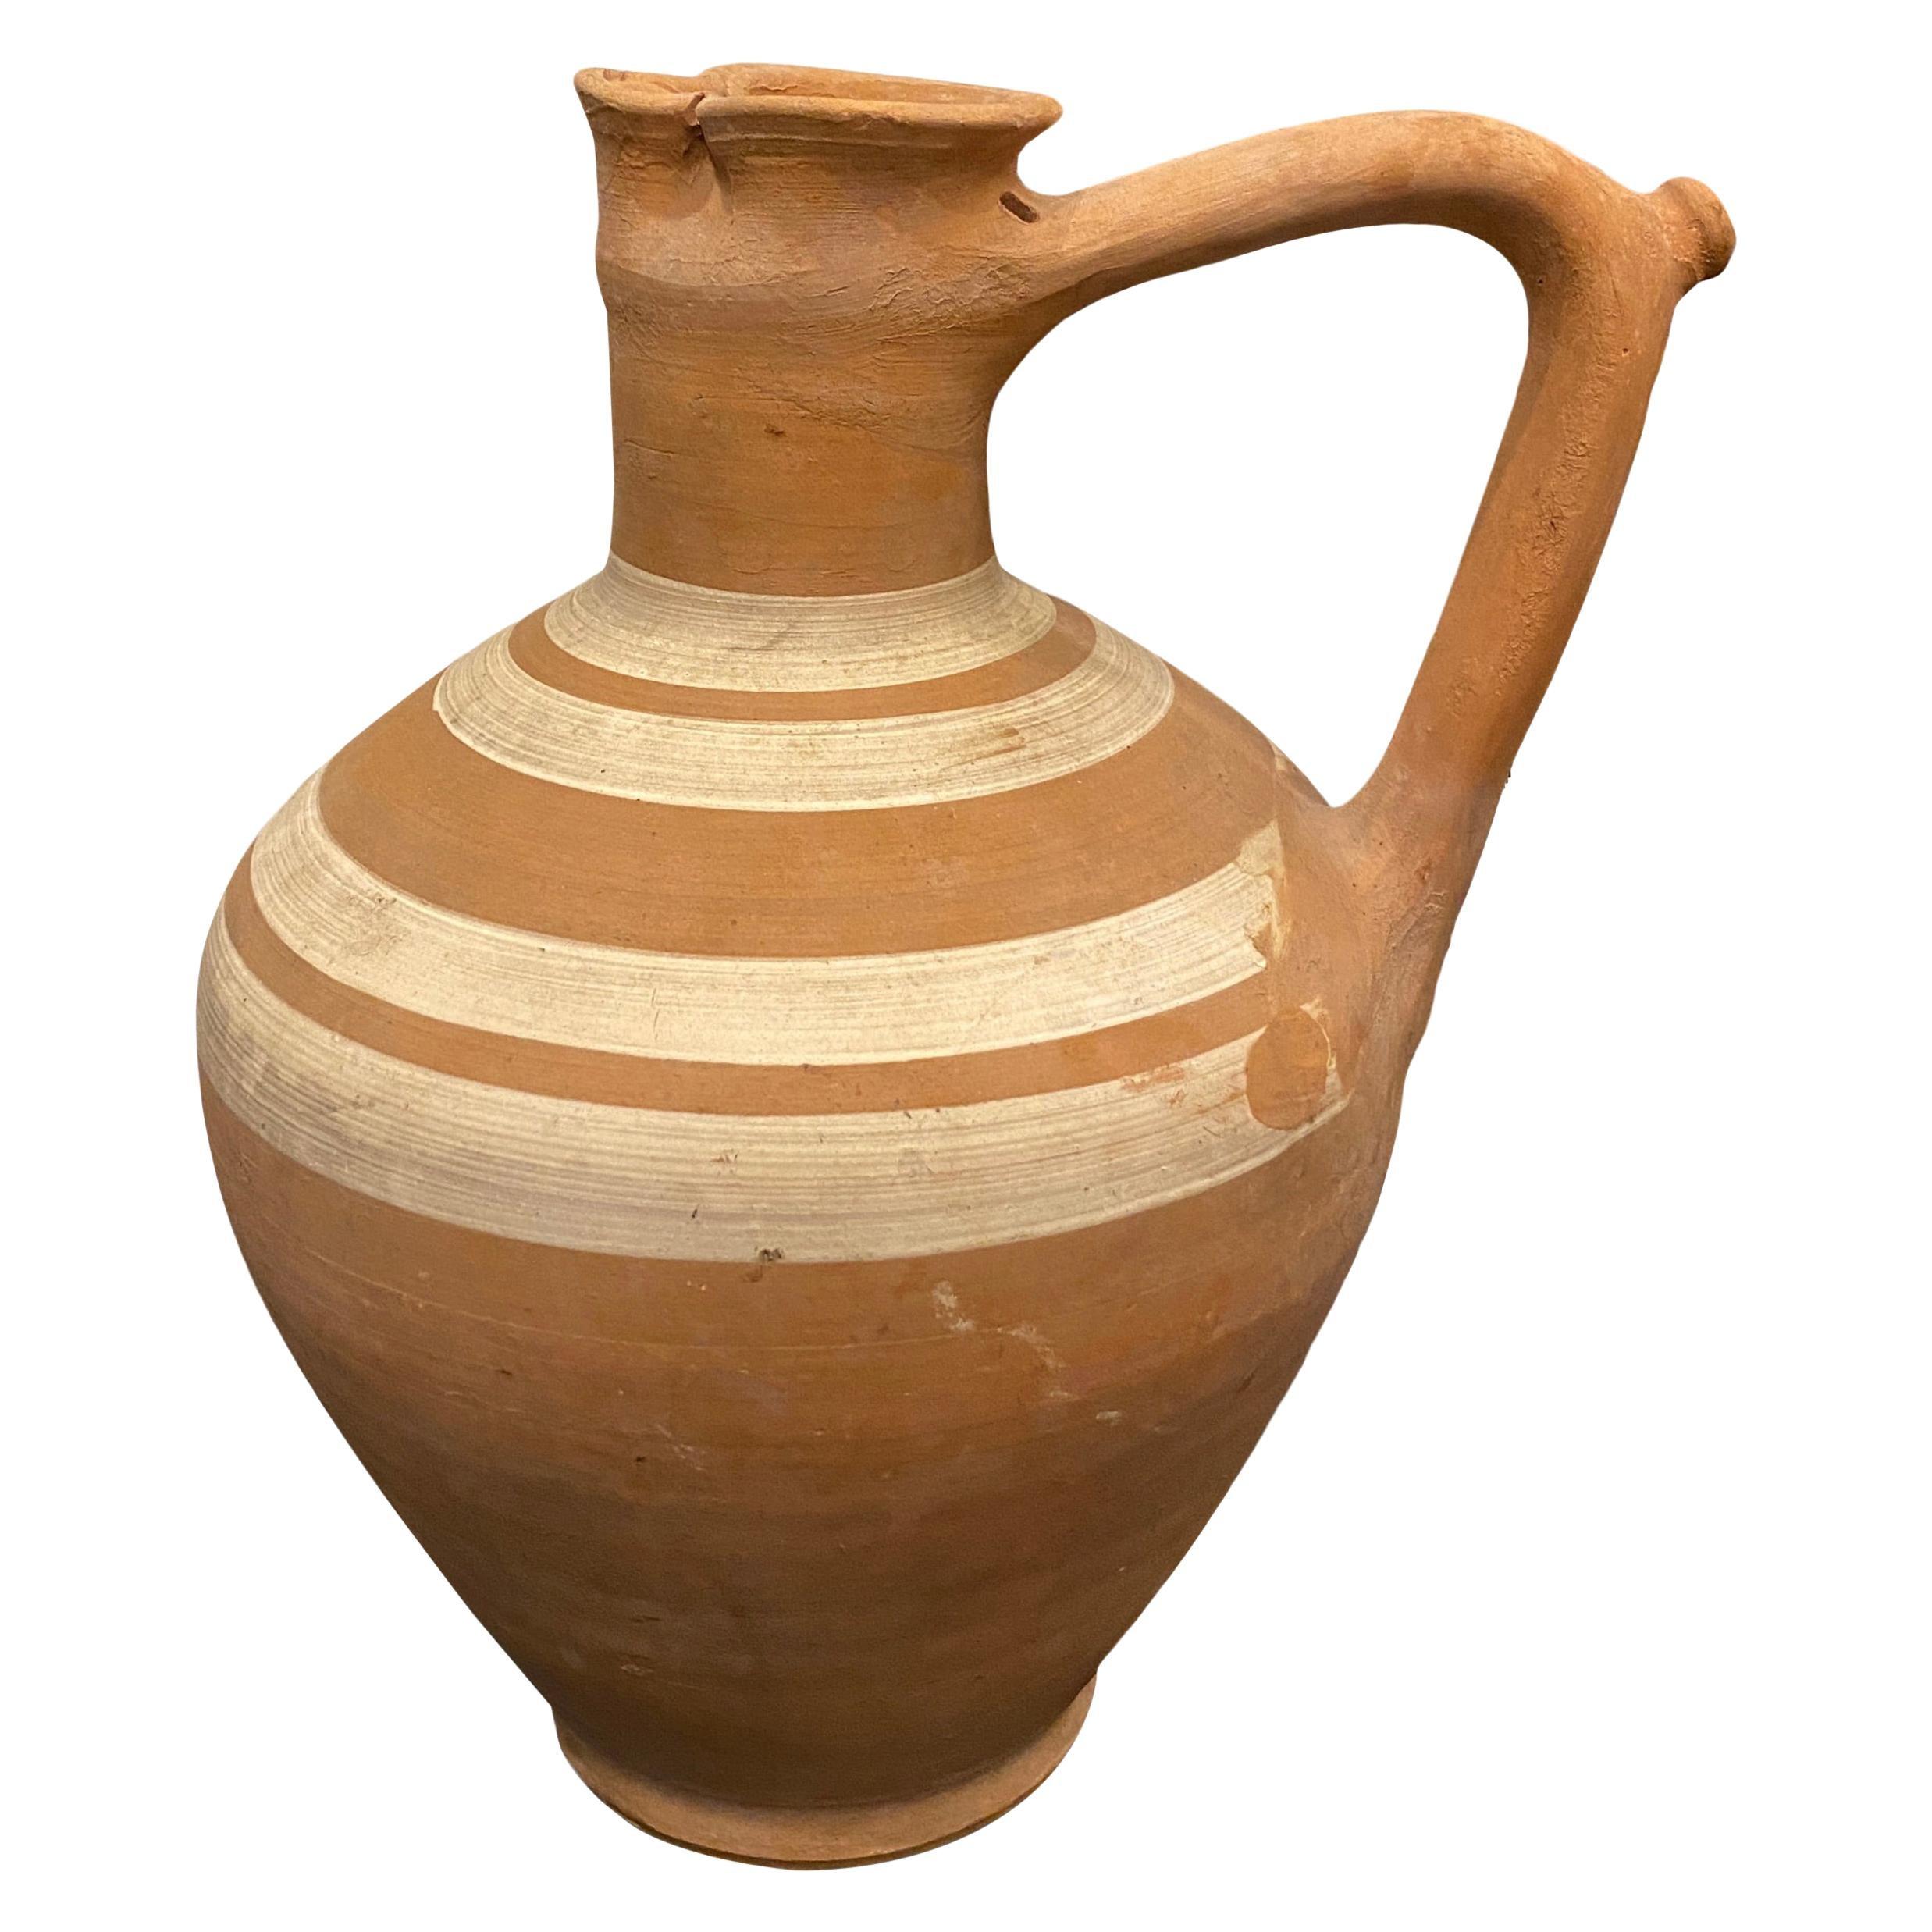 Vintage French Ceramic Wine Carafe